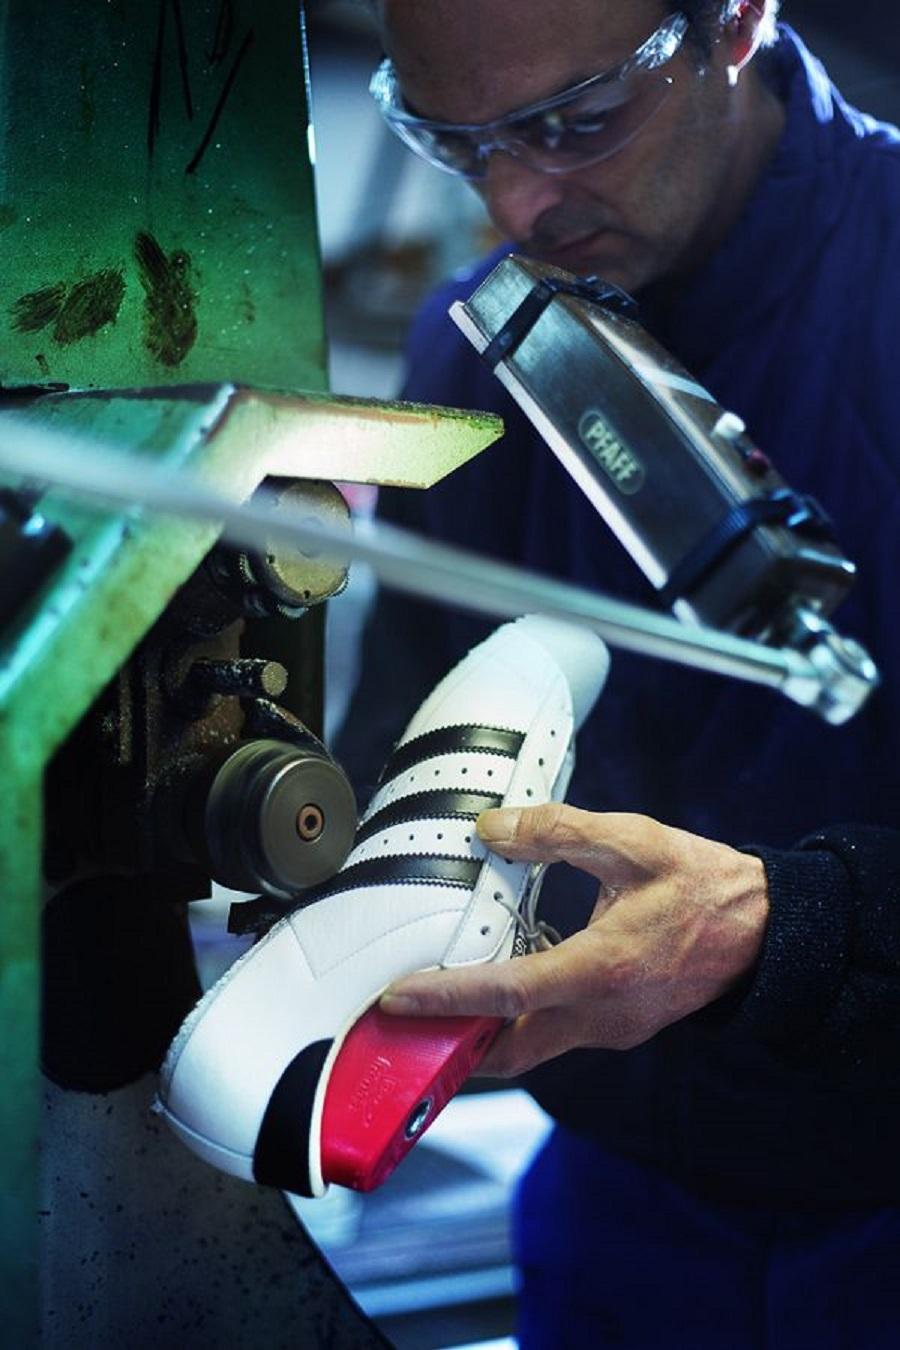 k-adidas Originals Superstar Made in France (8)